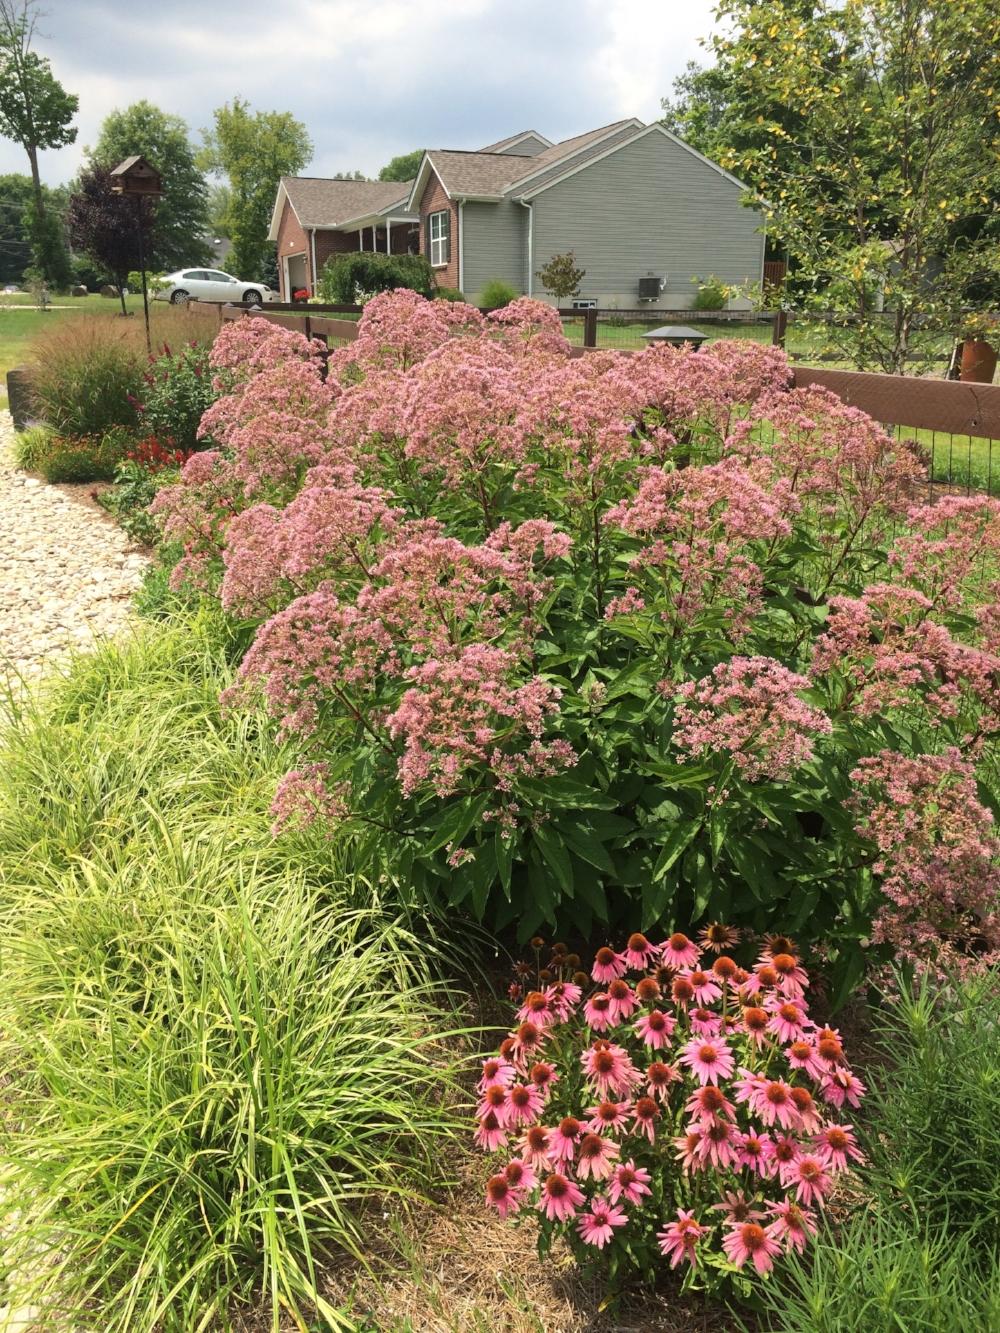 joe pye weed in full bloom along with echinacea